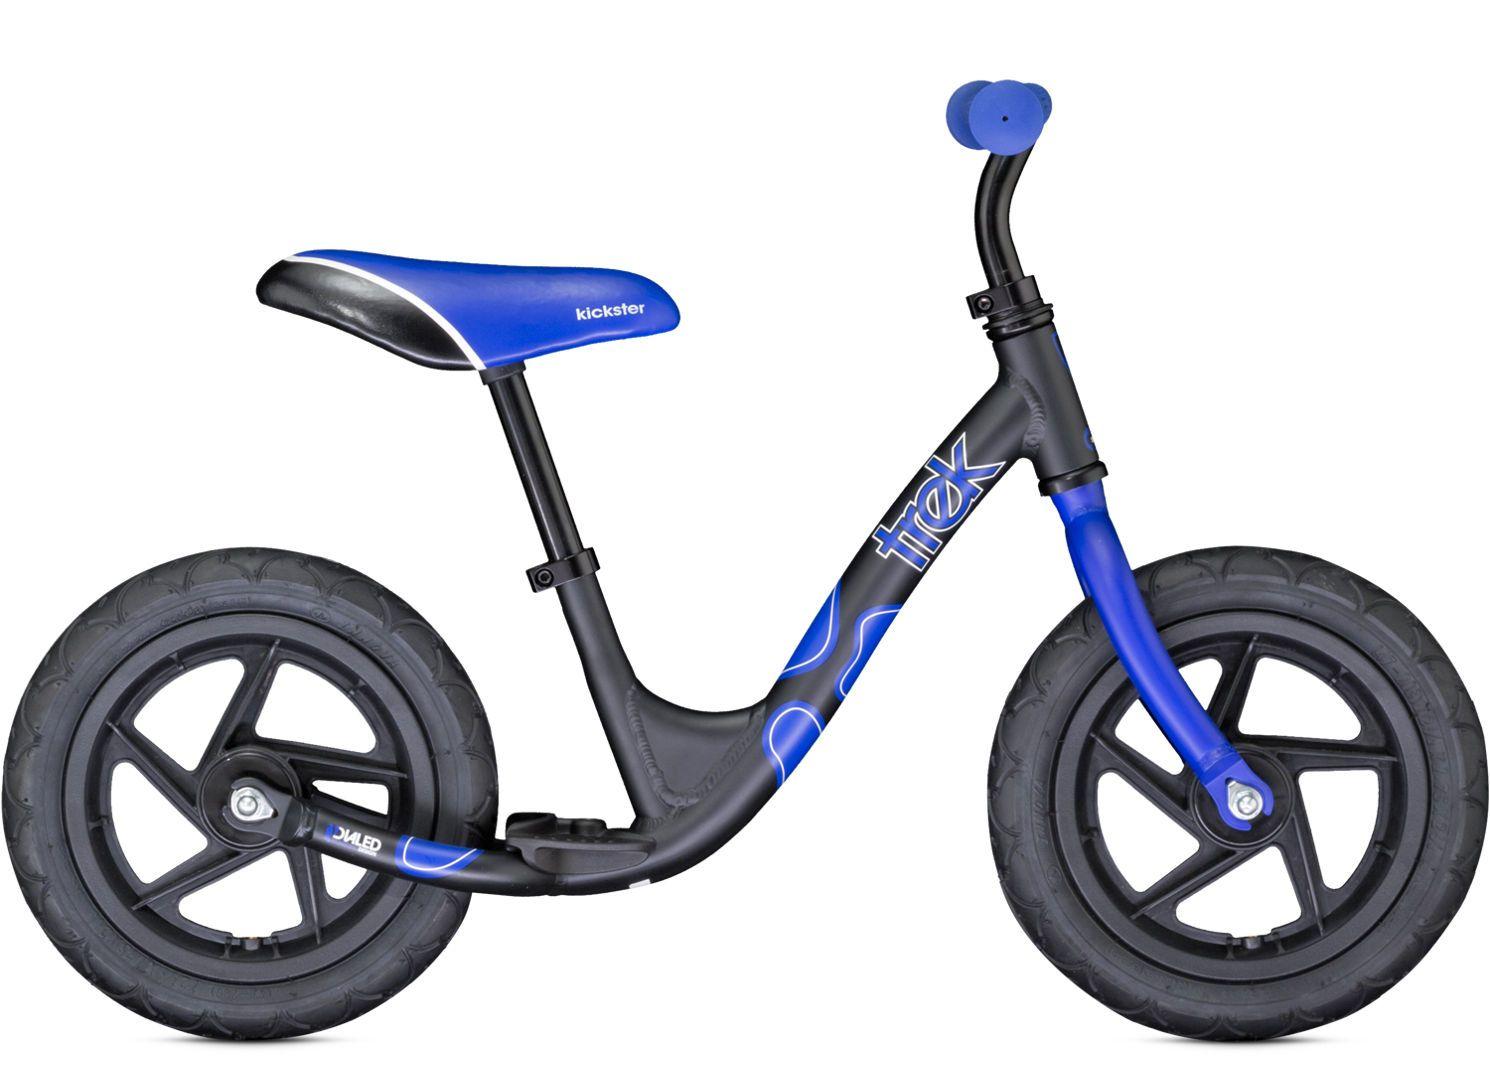 Kickster Kids Collection Trek Bicycle Bike Childrens Bike Trek Bicycle